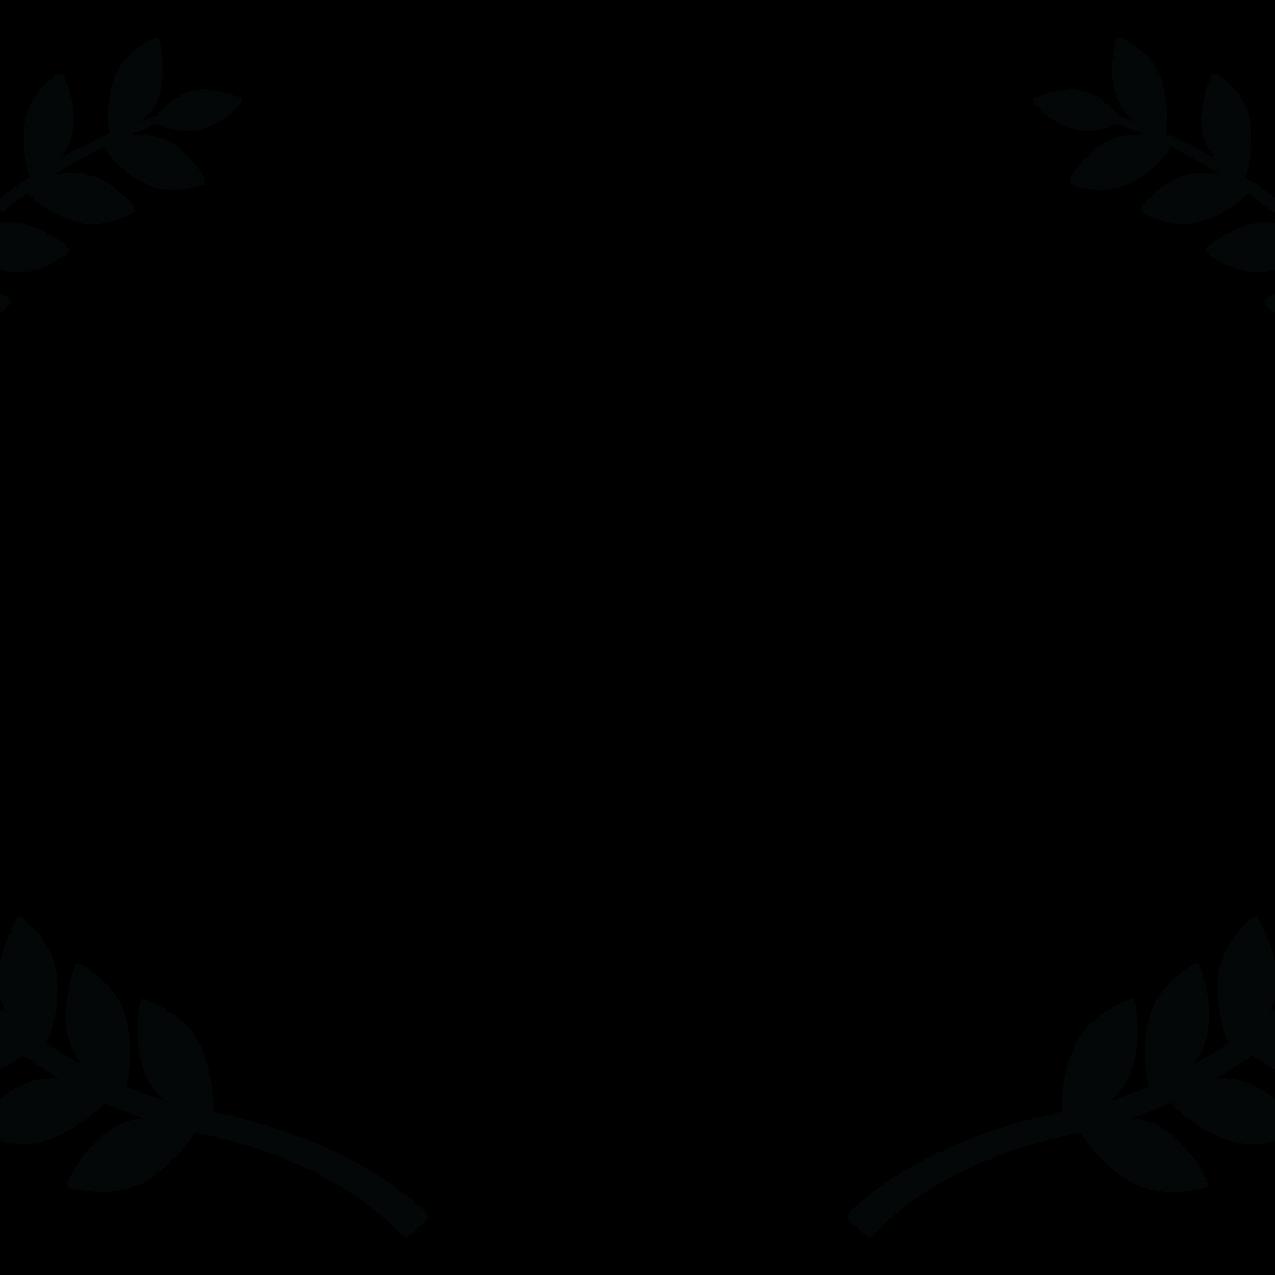 OFFICIALSELECTION-EVERYWOMANBIENNIALfilm